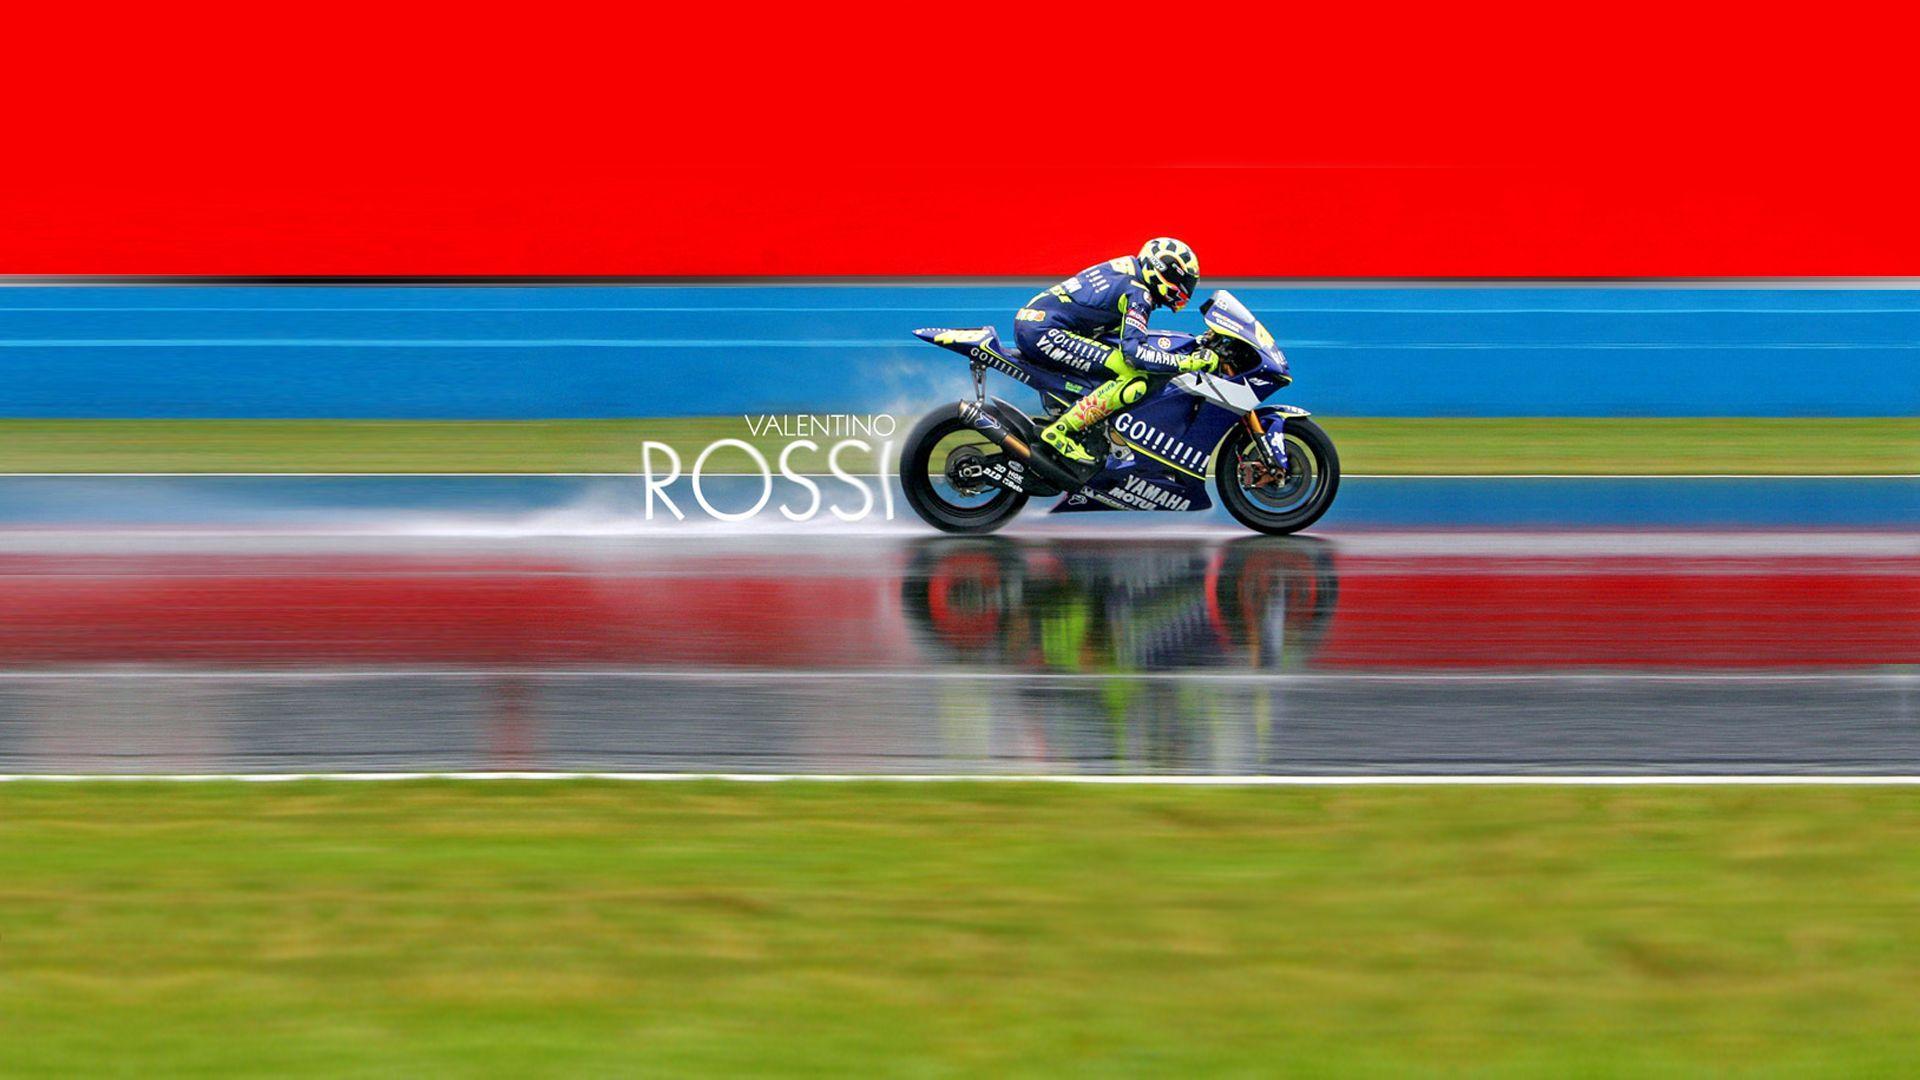 Valentino Rossi Motogp Racer HD Wallpaper Free - Download ...